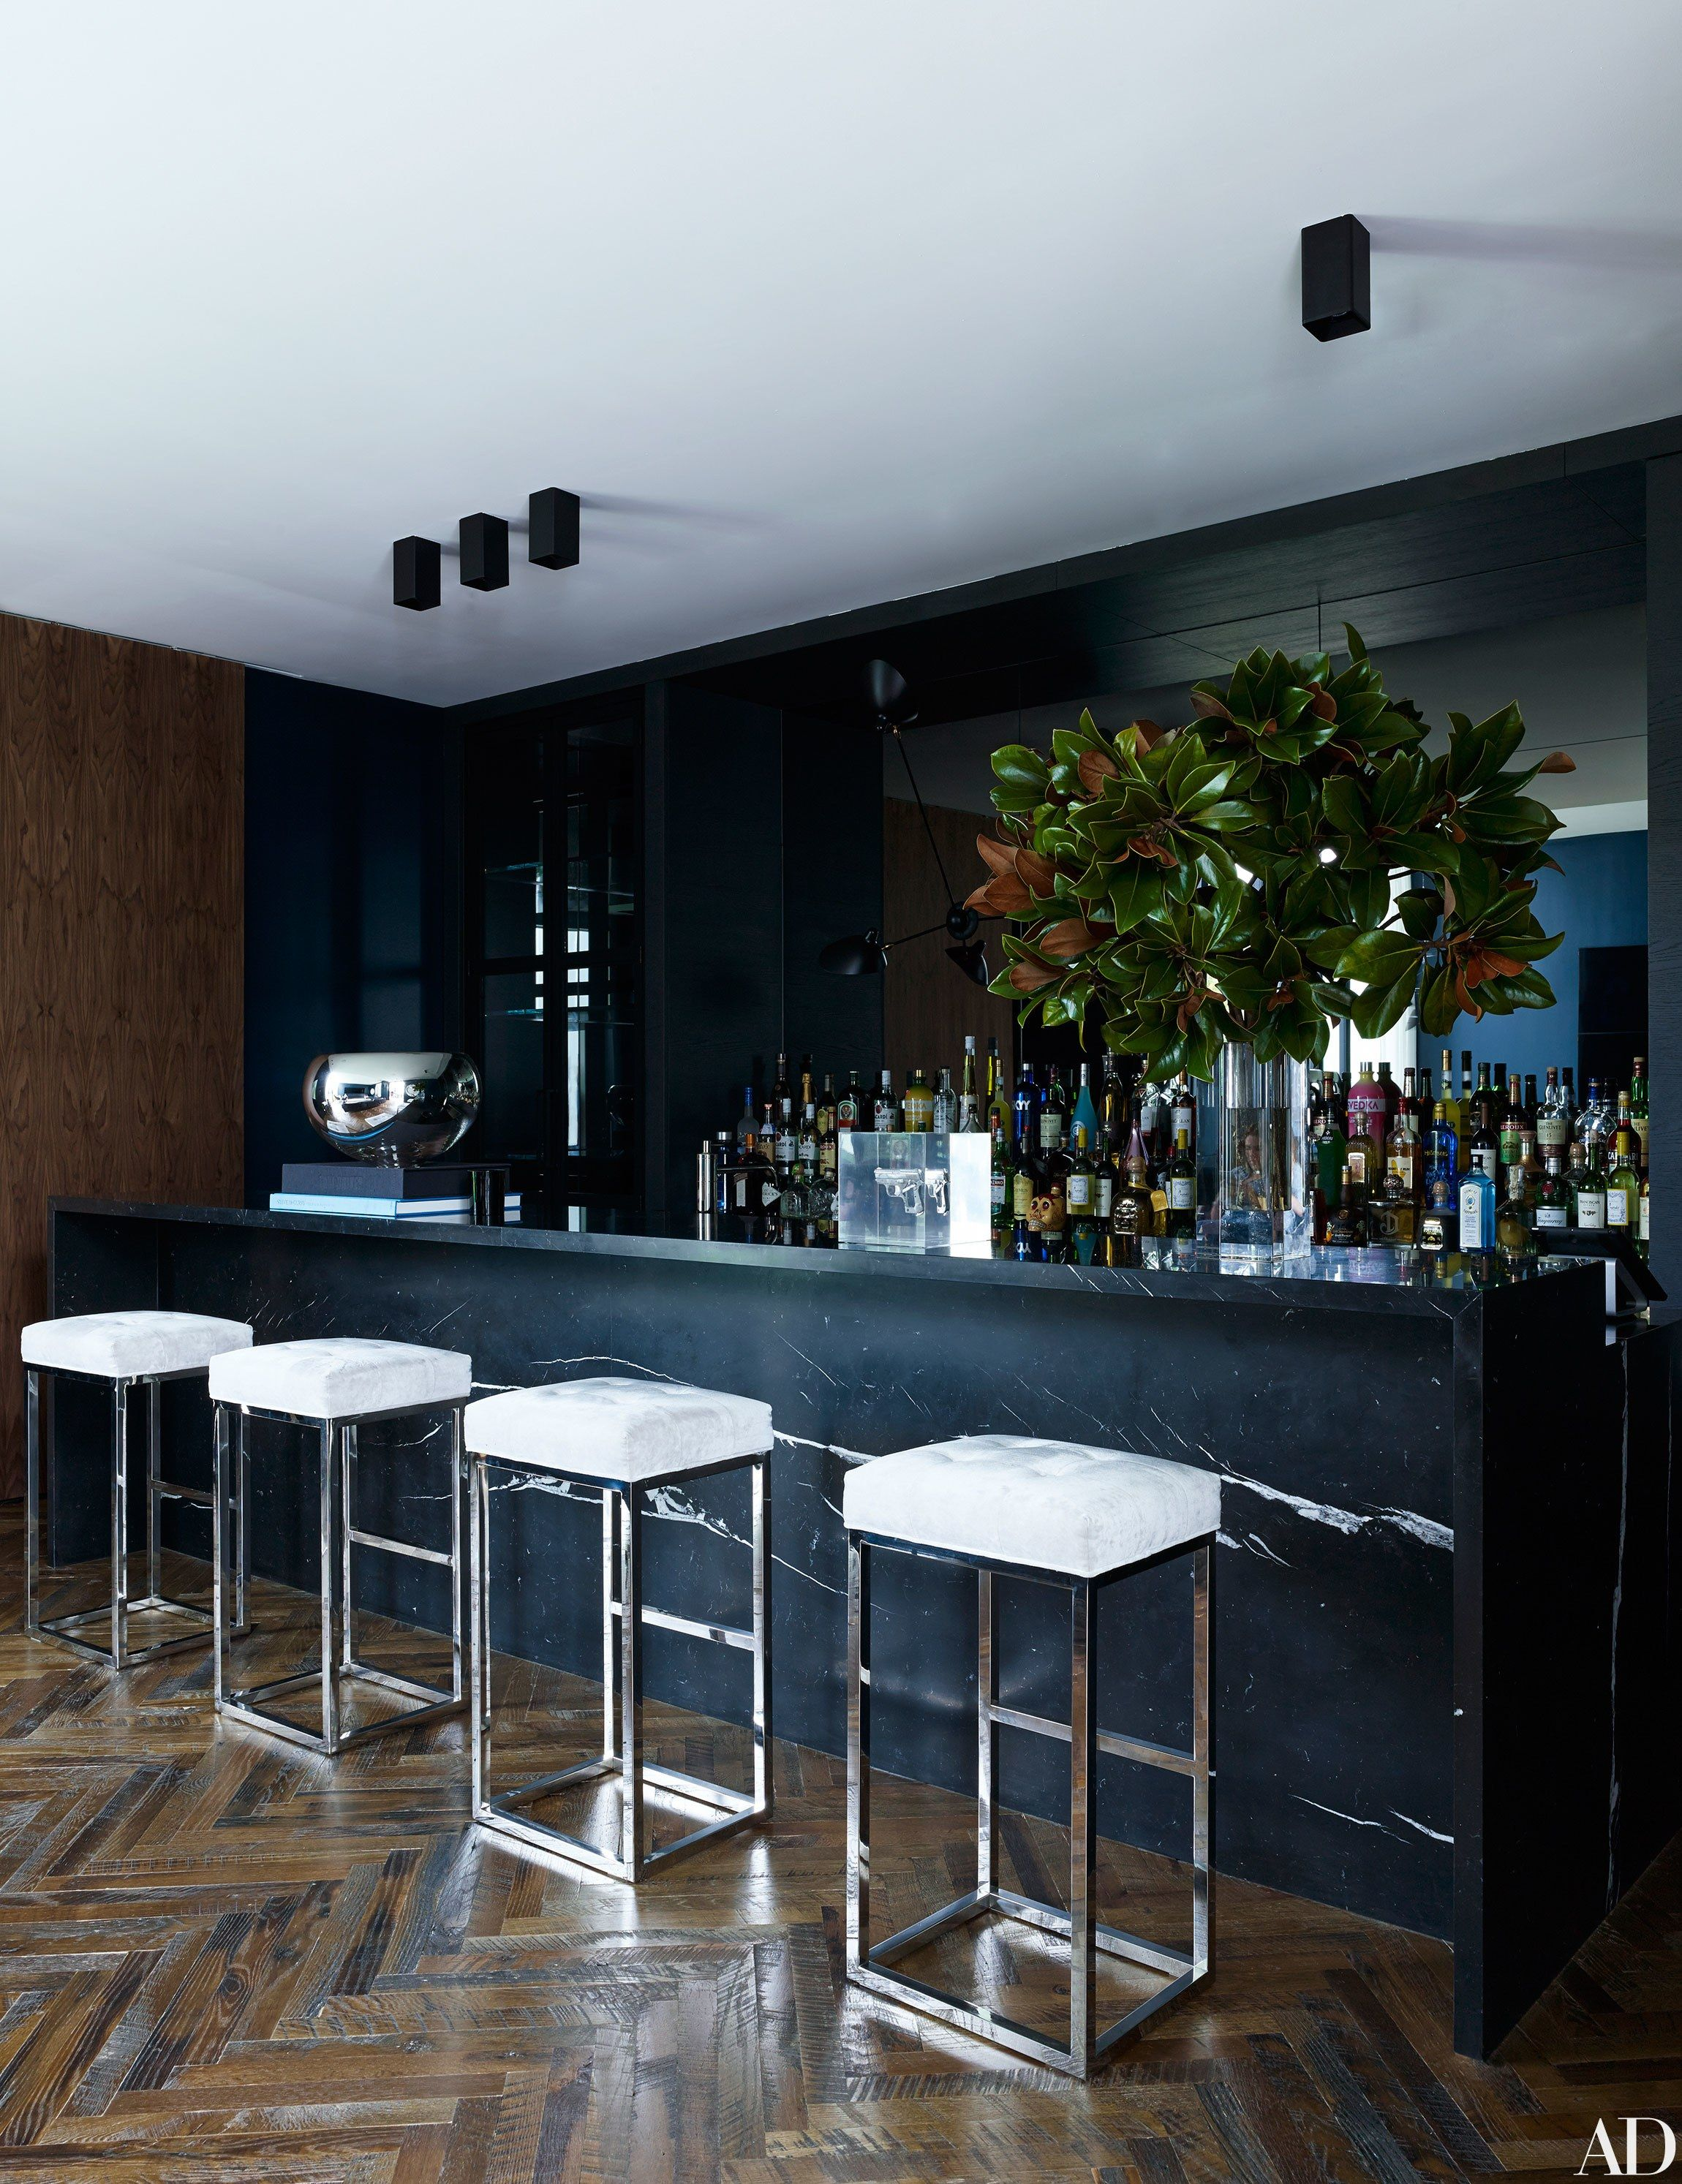 Alex Rodriguez Invites Ad Inside His Coral Gables Florida Home Alex Rodriguez Interior Design Kitchen Celebrity Houses